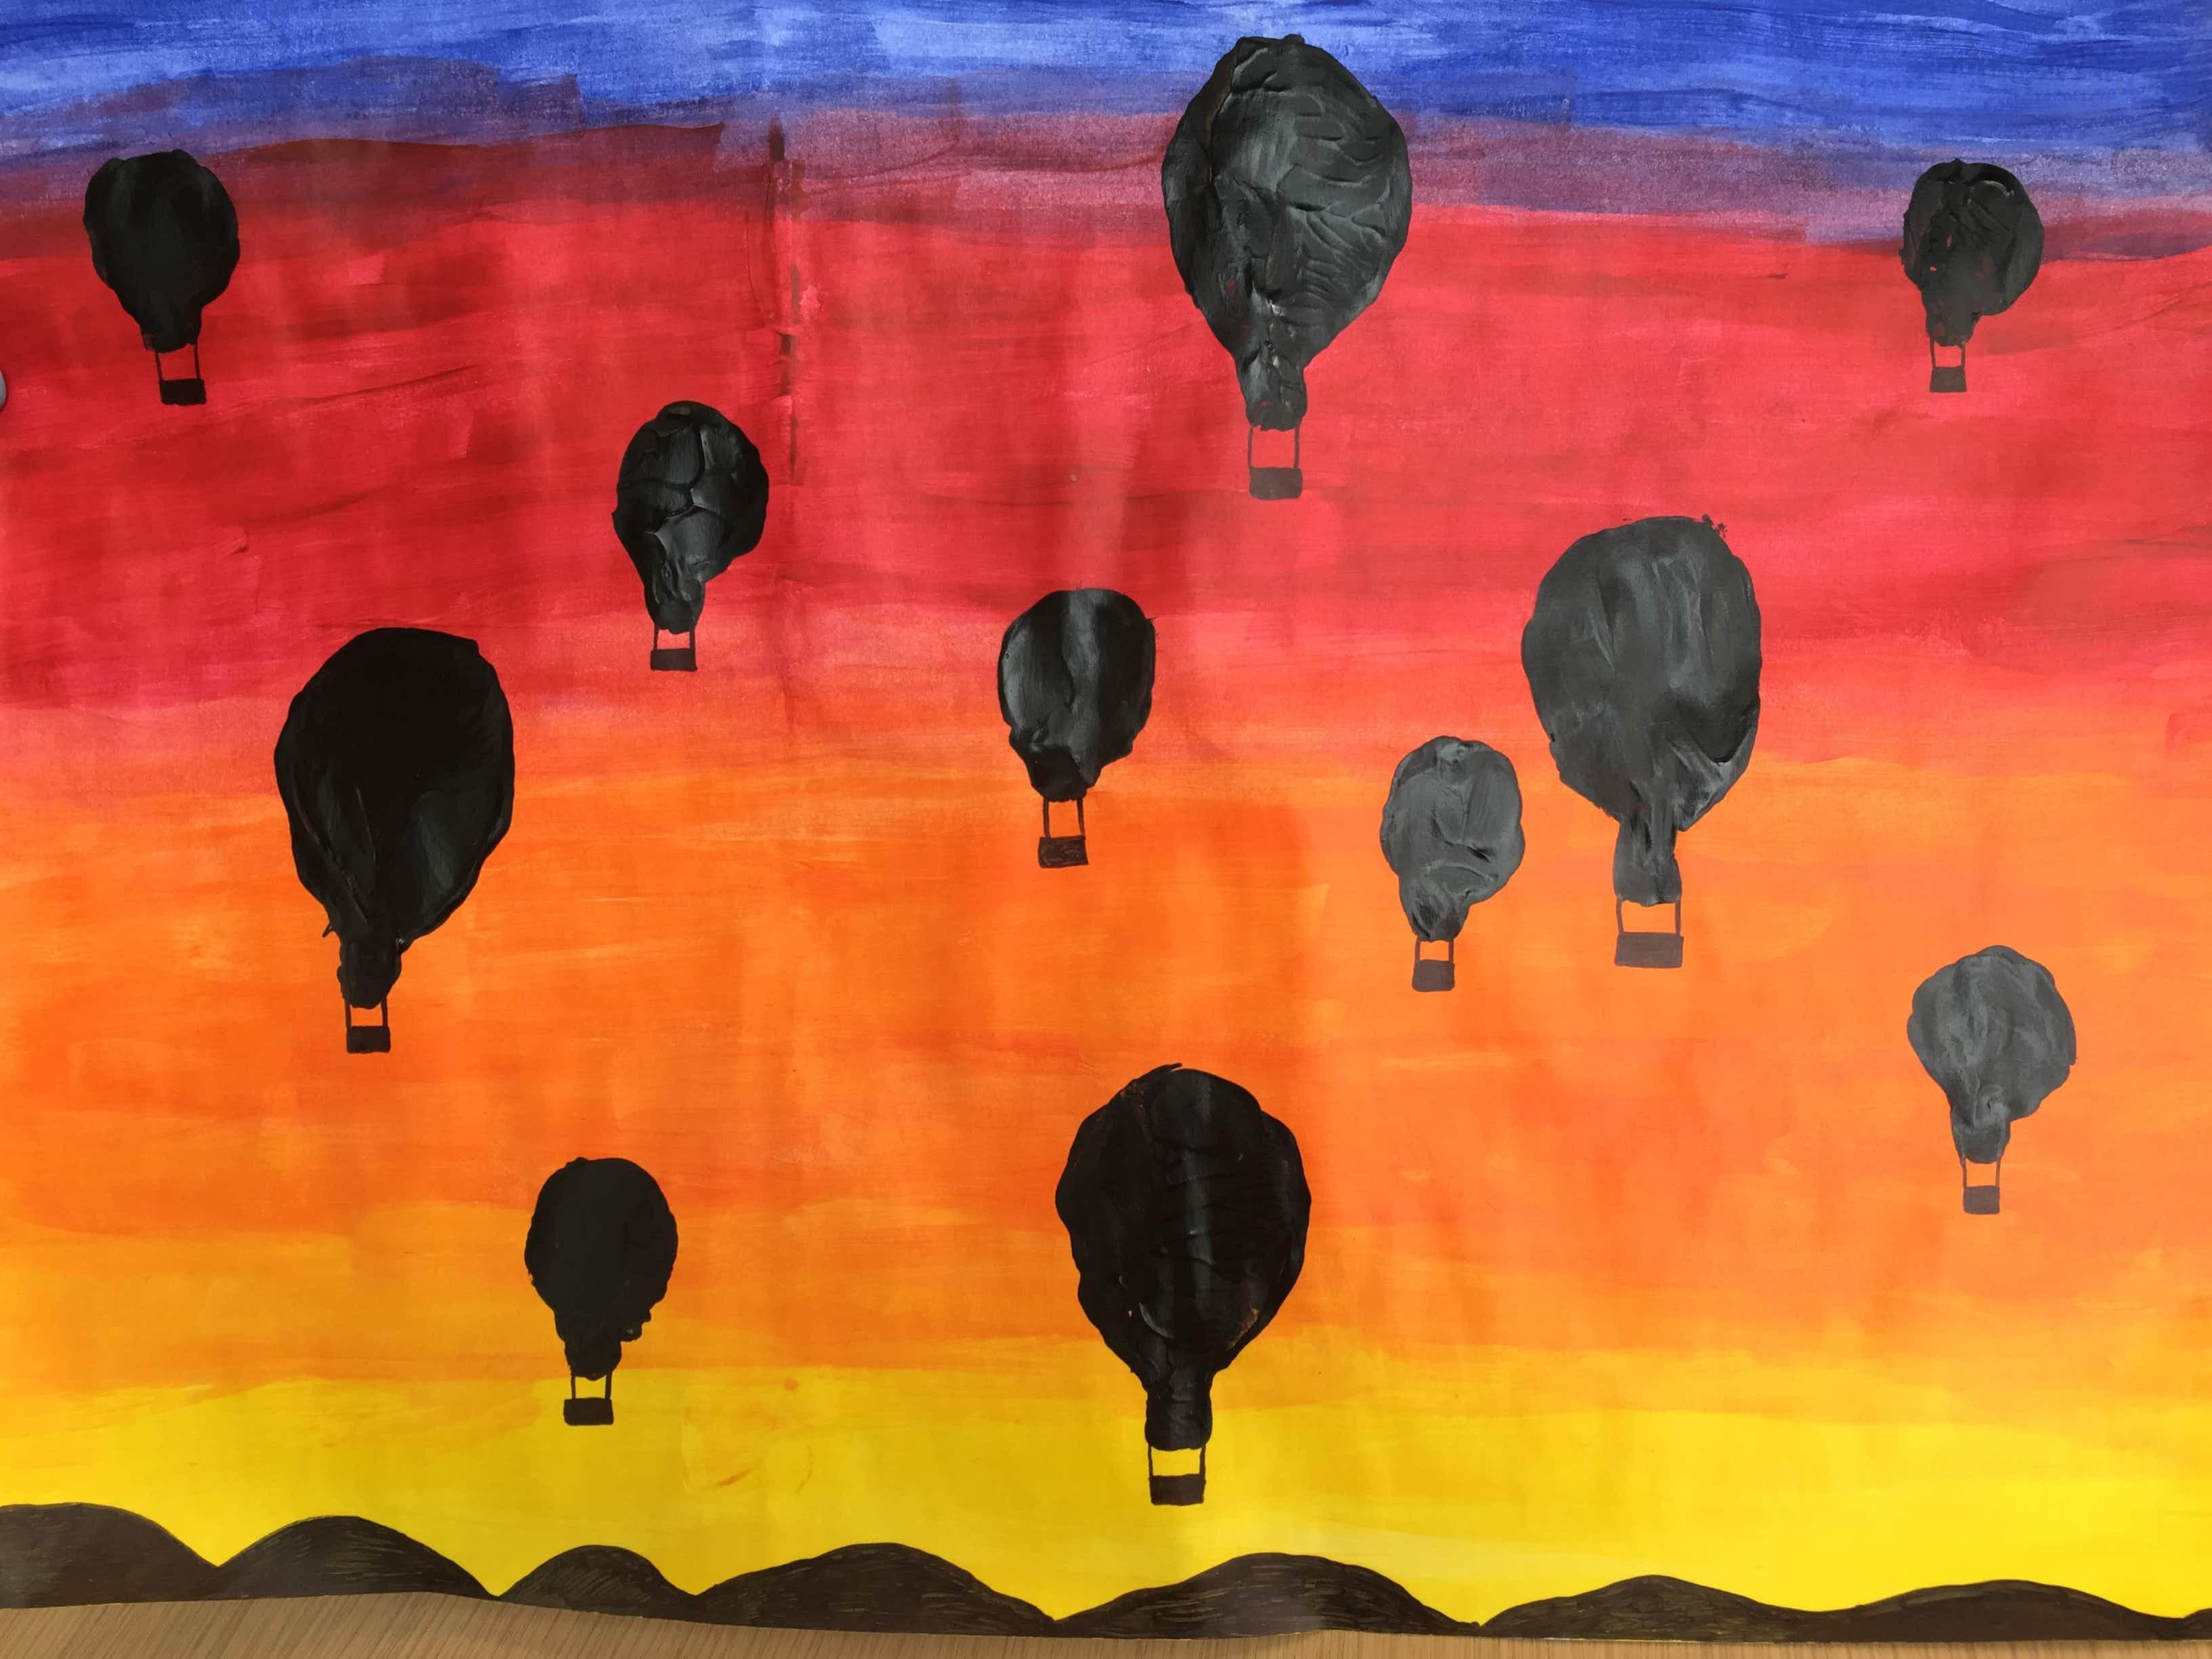 Rainy day activity: hot-air balloon potato stamps